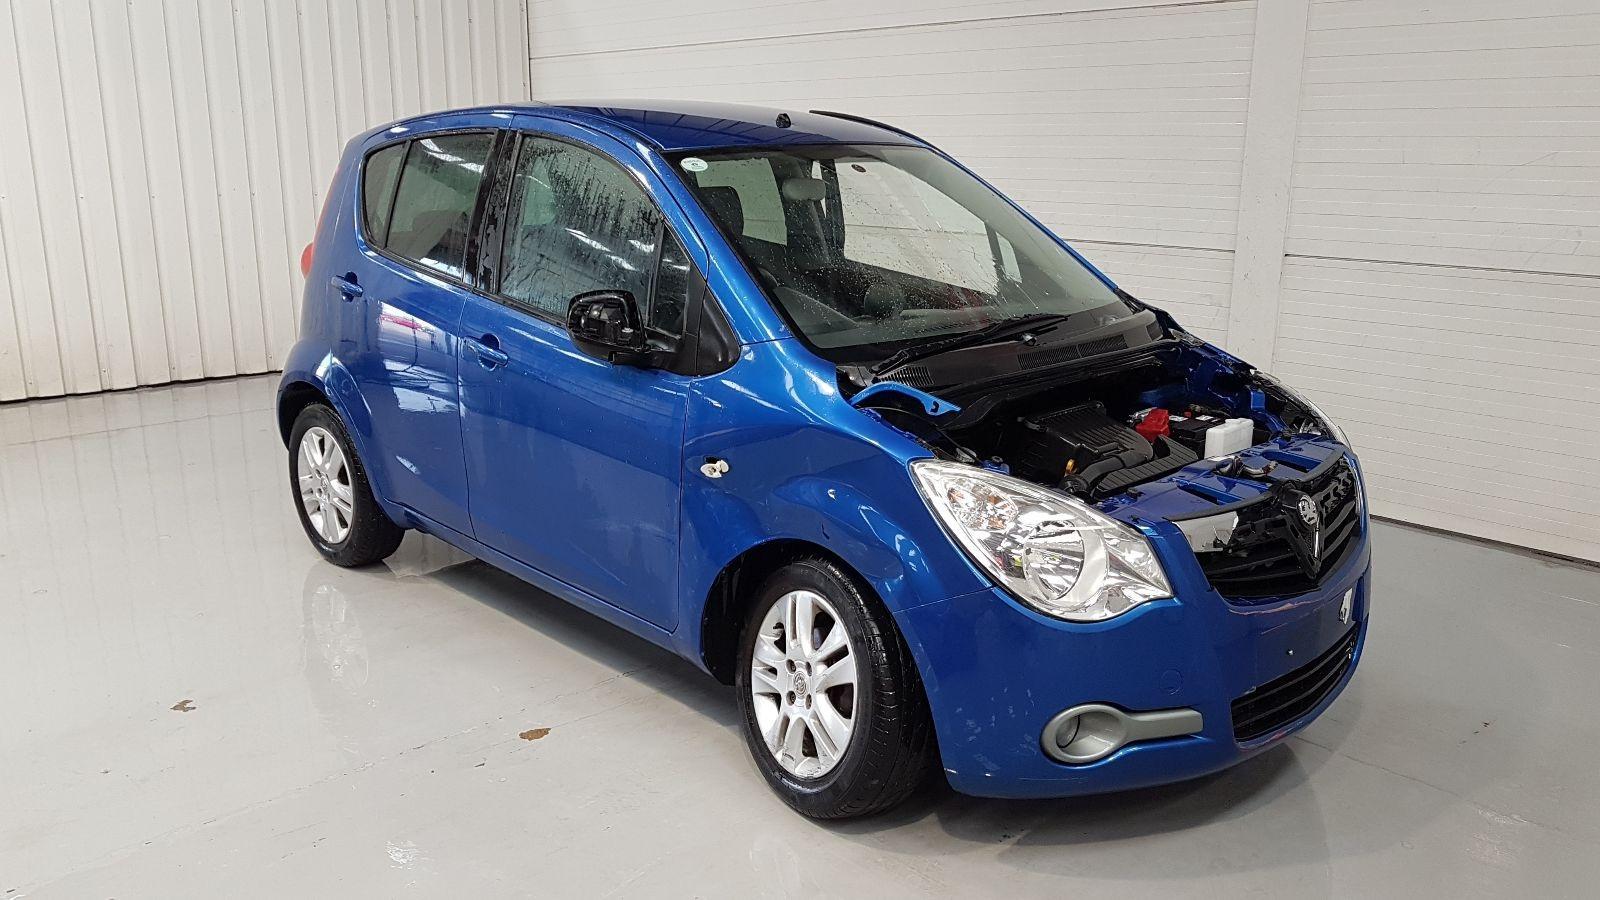 Image for a Vauxhall Agila 2012 5 Door Hatchback